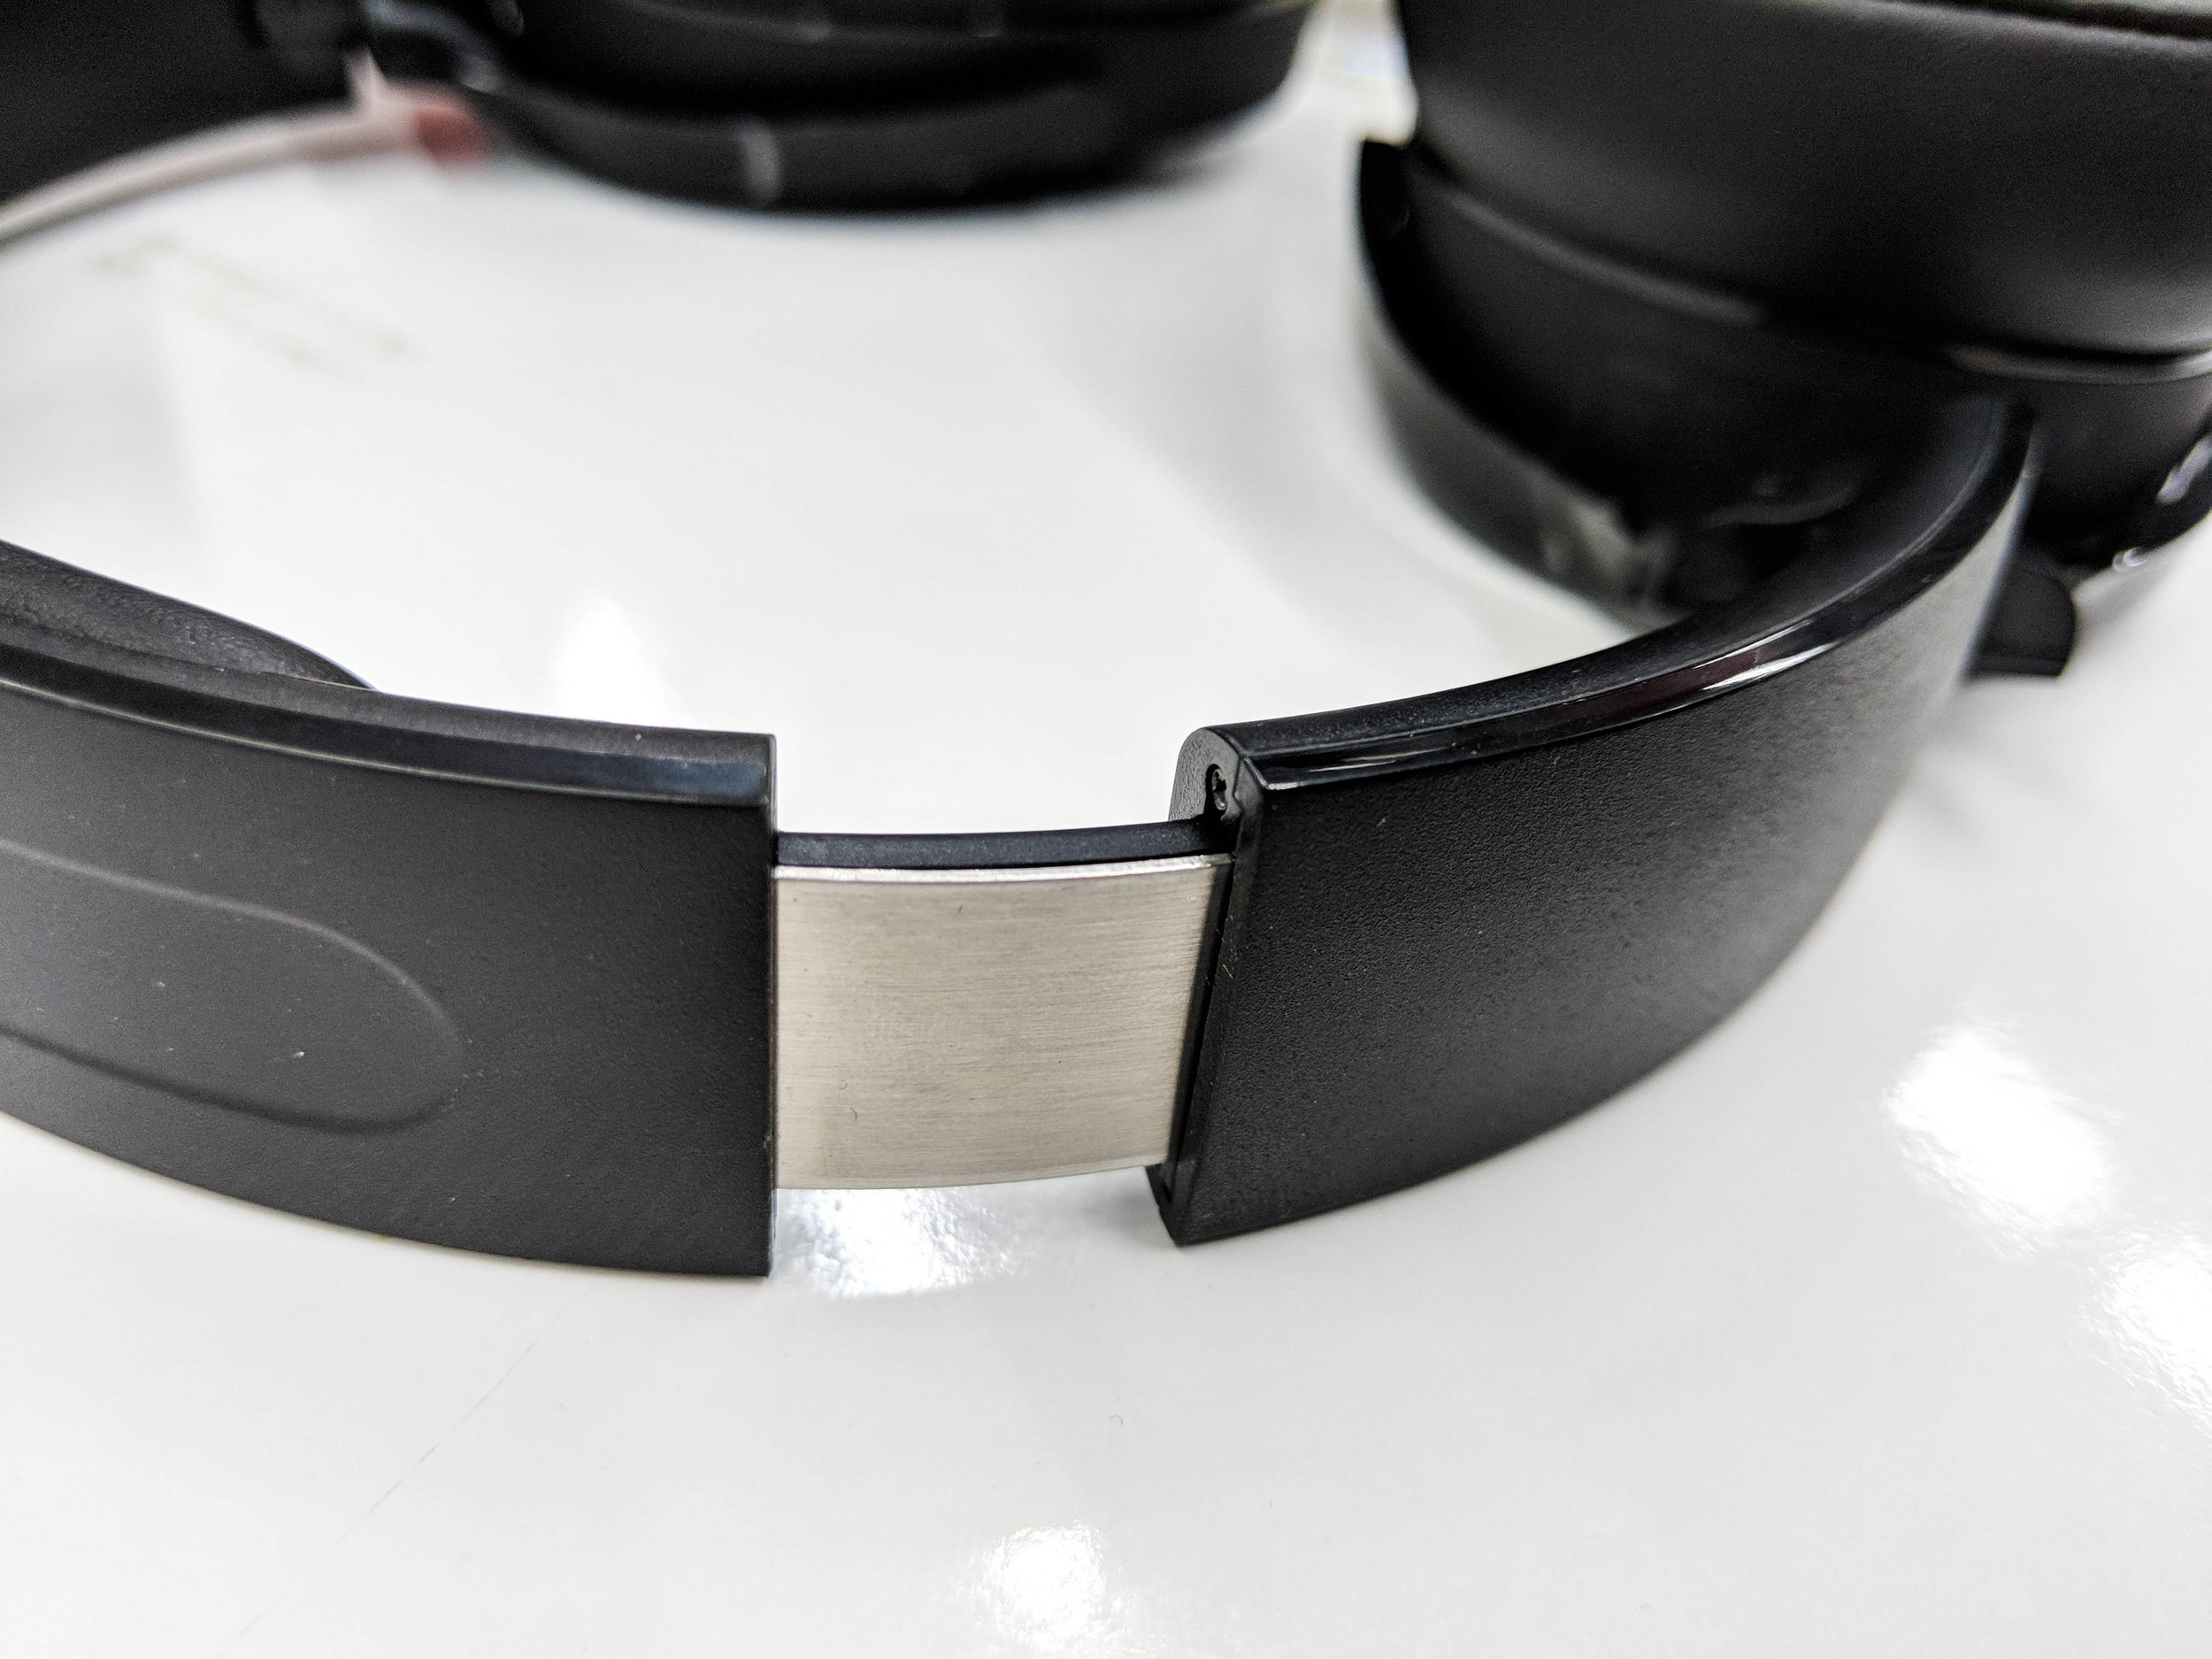 Skullcandy Hesh 3 wireless headphone.